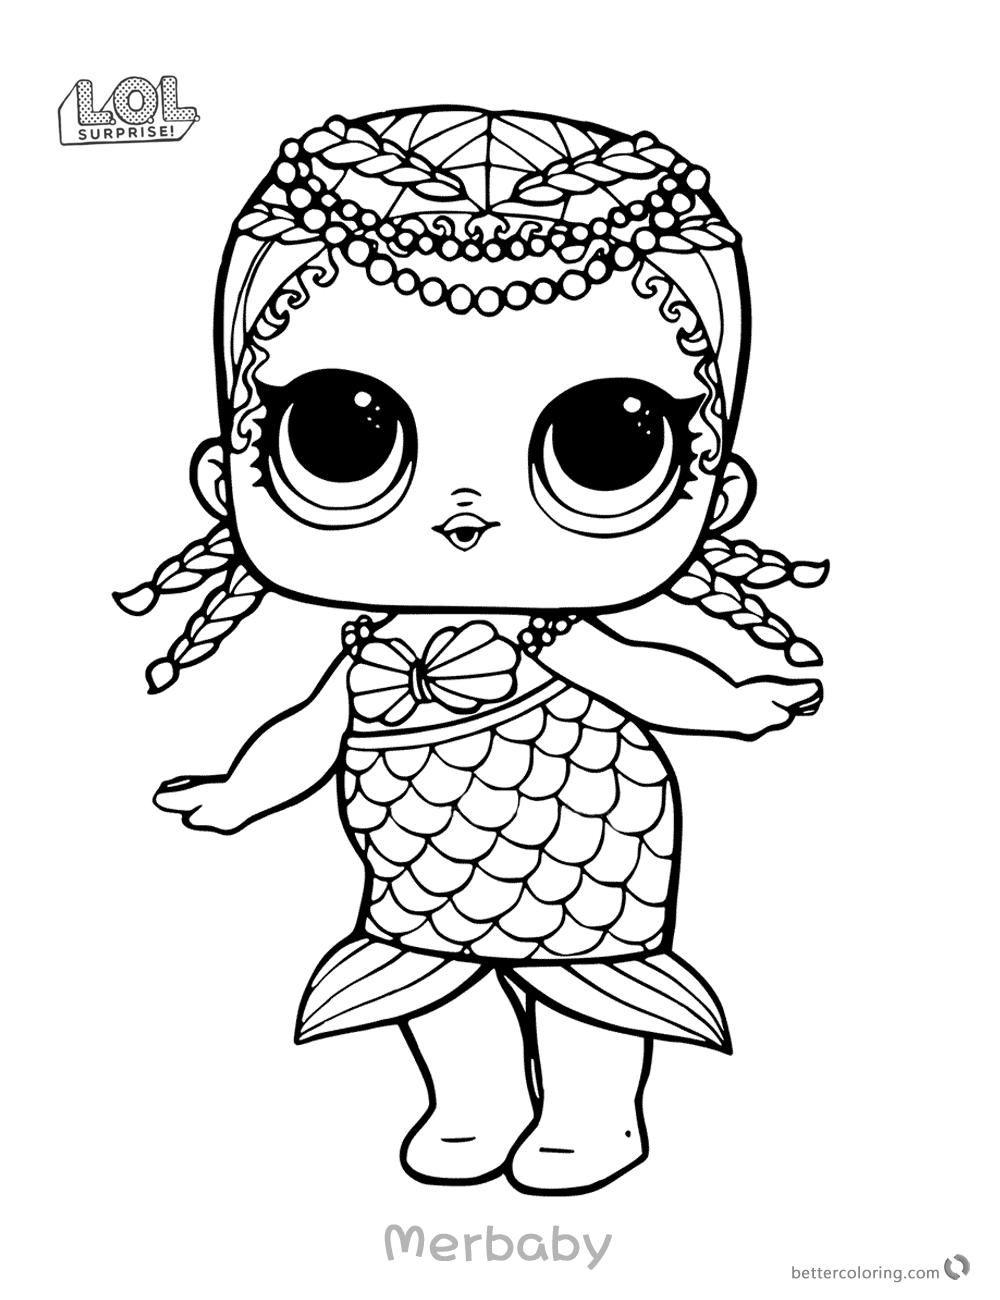 18 Coloring Page Unicorn Mermaid Unicorn Coloring Pages Mermaid Coloring Pages Free Kids Coloring Pages